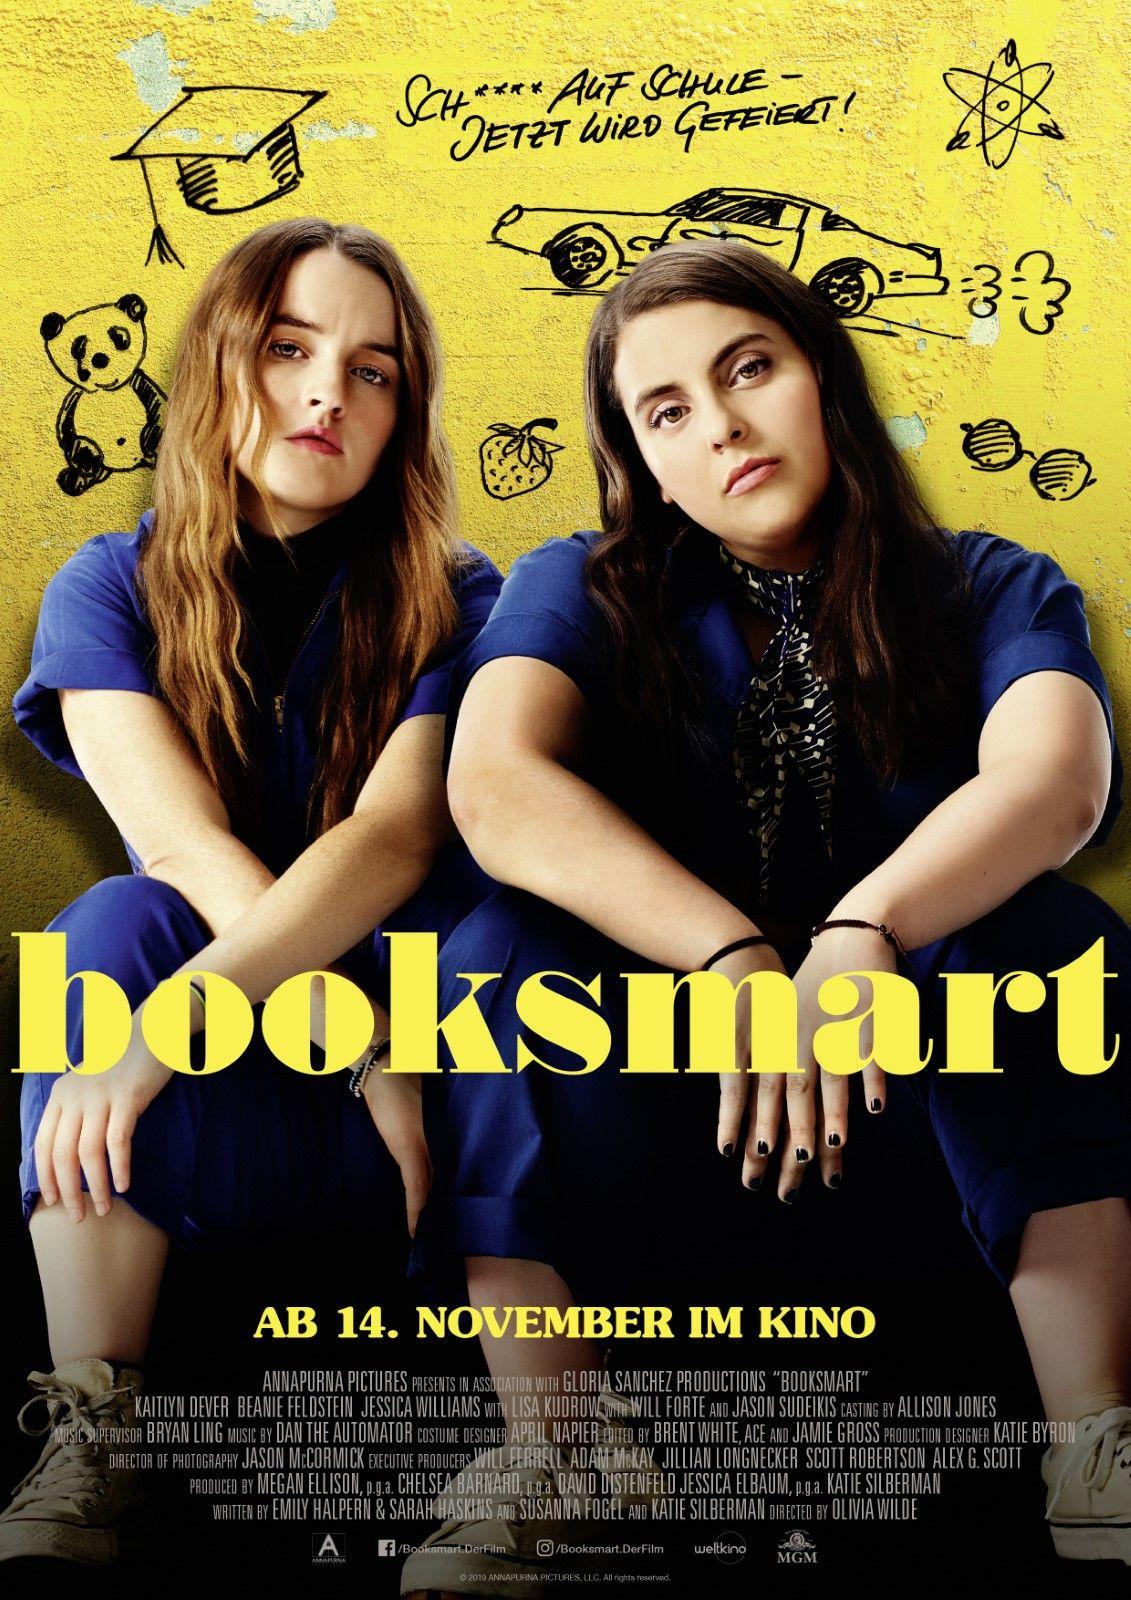 Booksmart: The Best Top 10 Movies to Binge Watch on Hulu